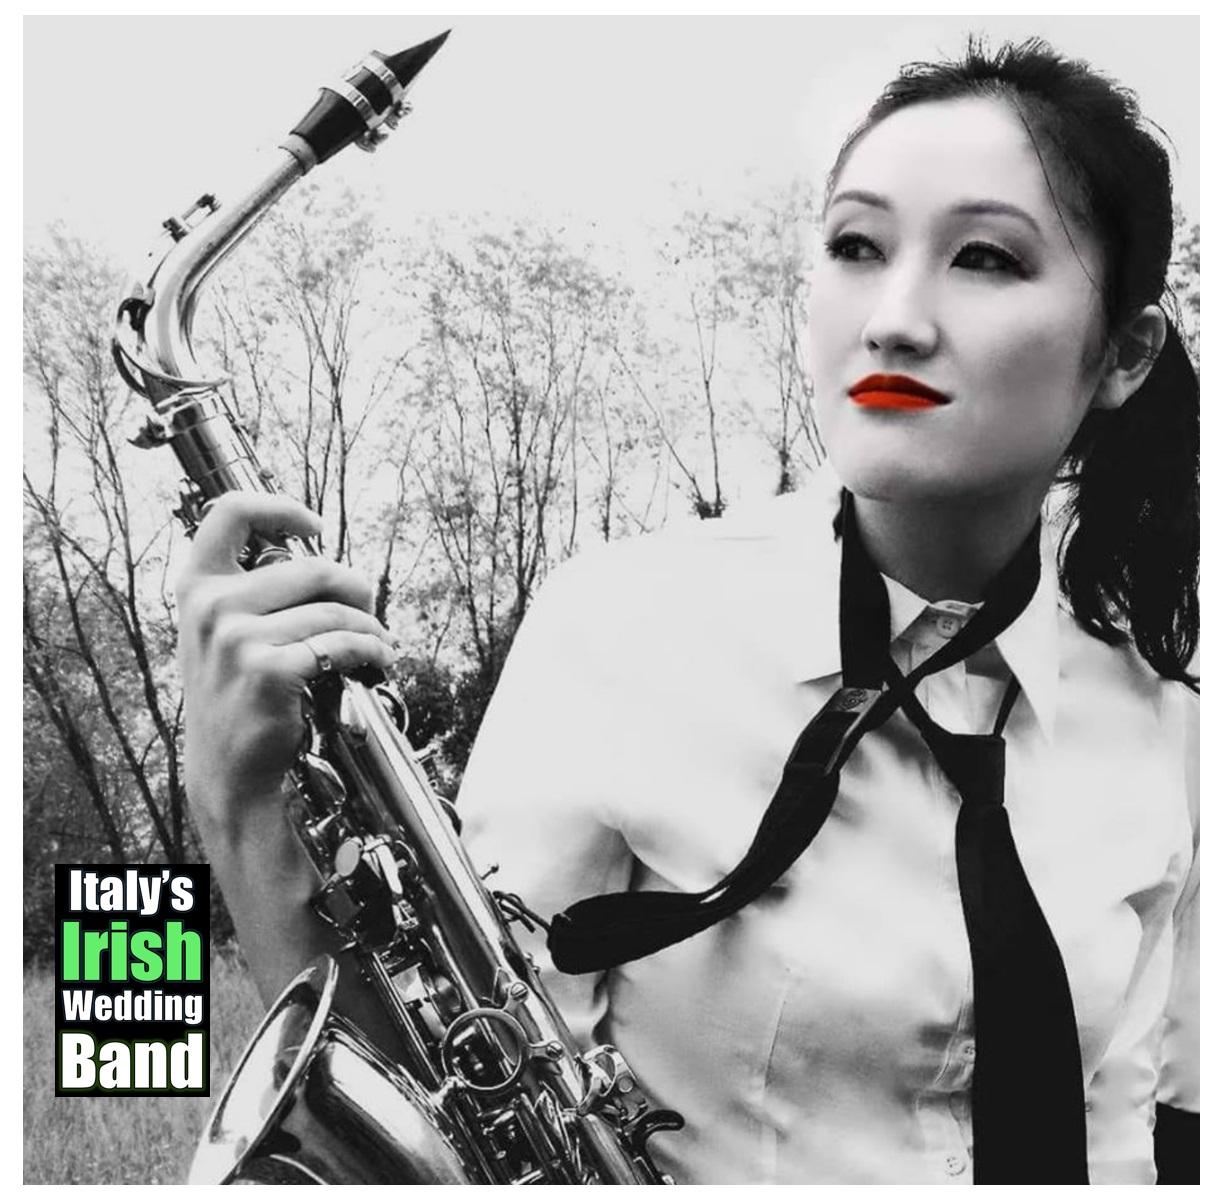 Italy's Irish Wedding Band Saxophonist and Classical Pianist Thasie italysirishweddingband.com